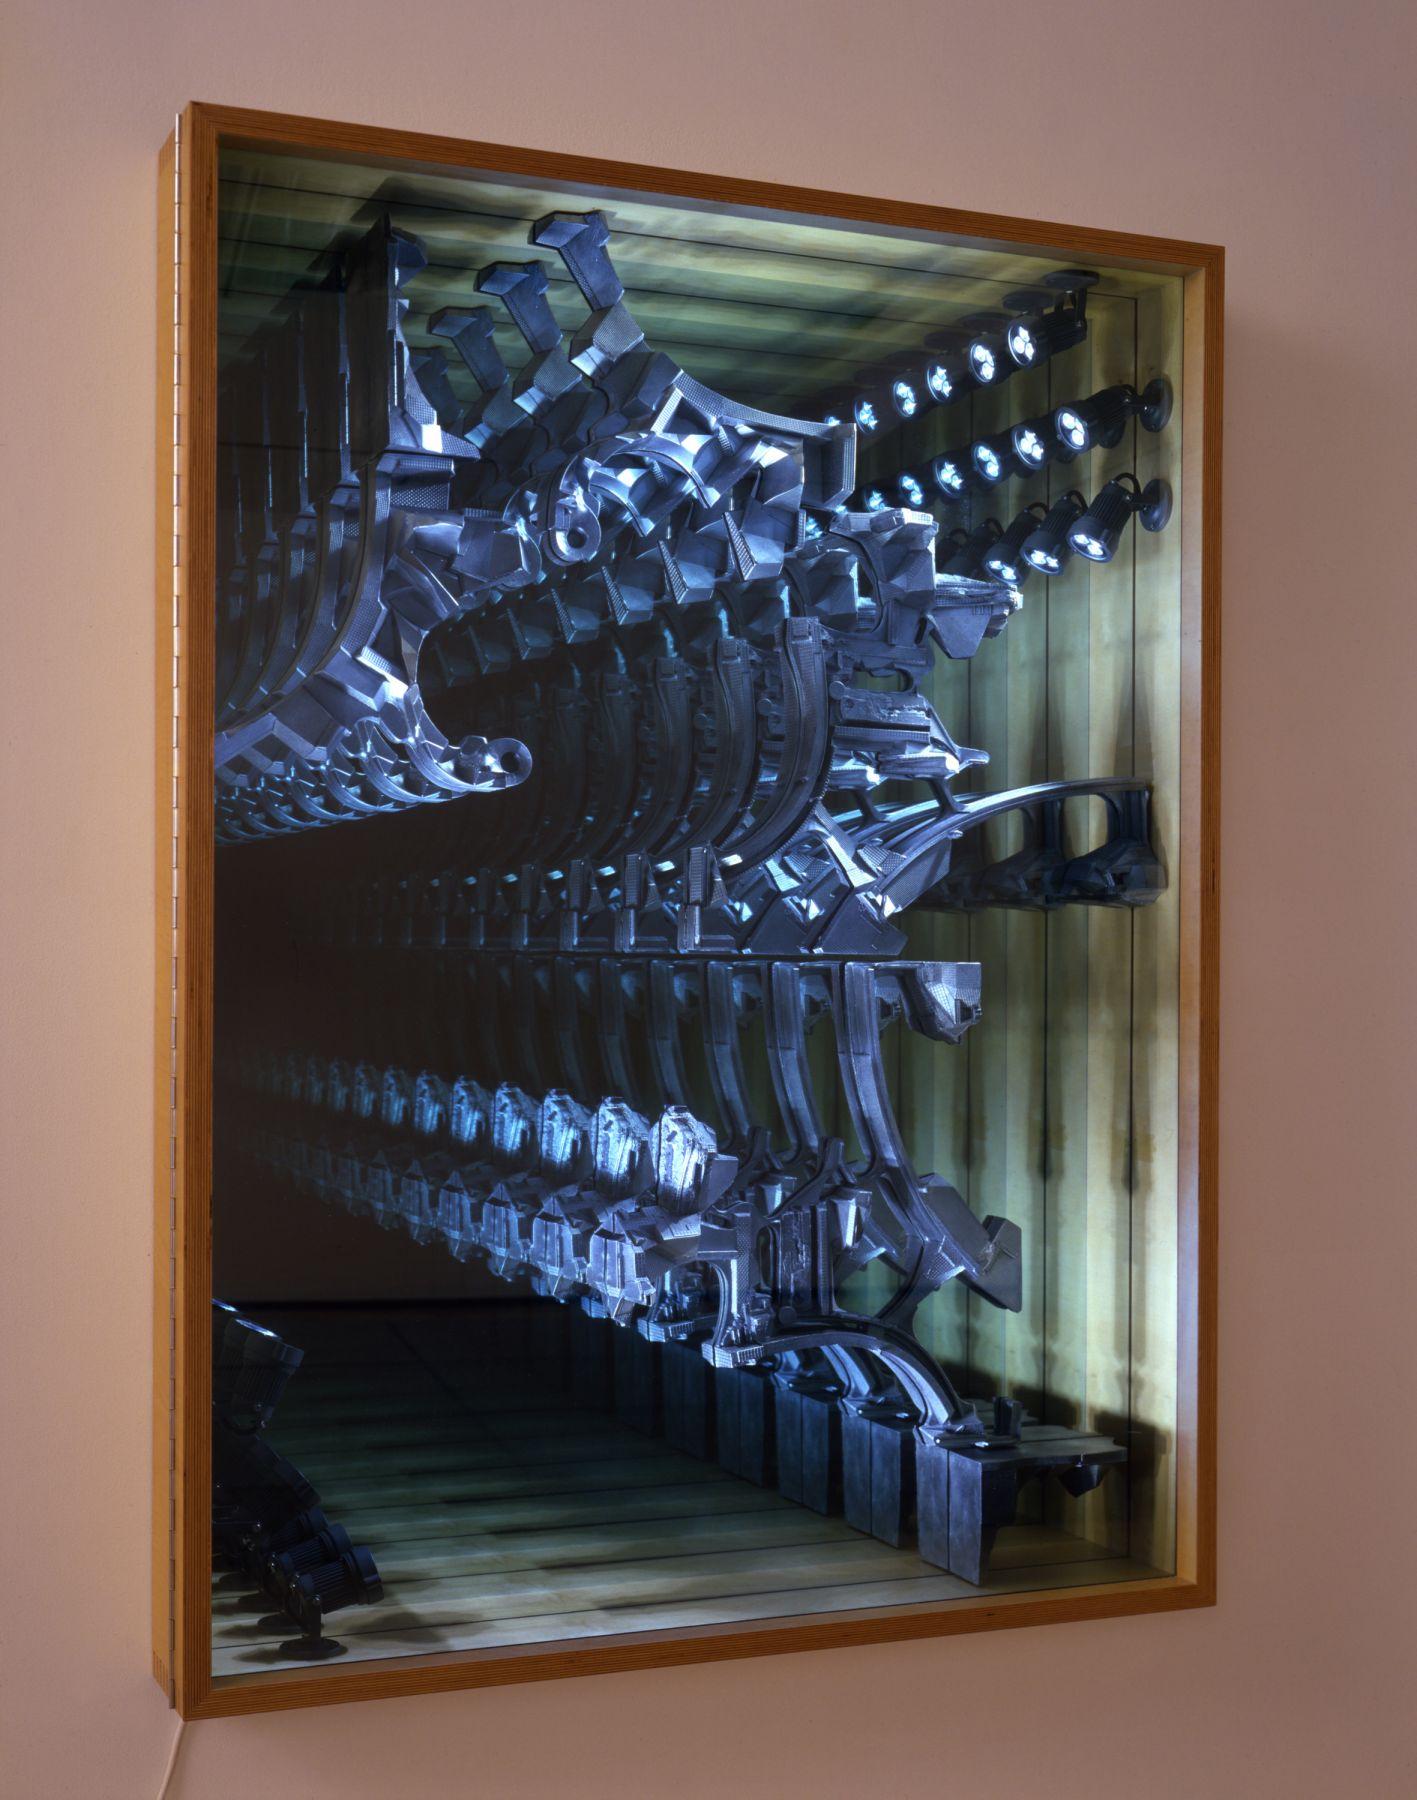 LEE BUL Untitled (Infinity wall), 2008